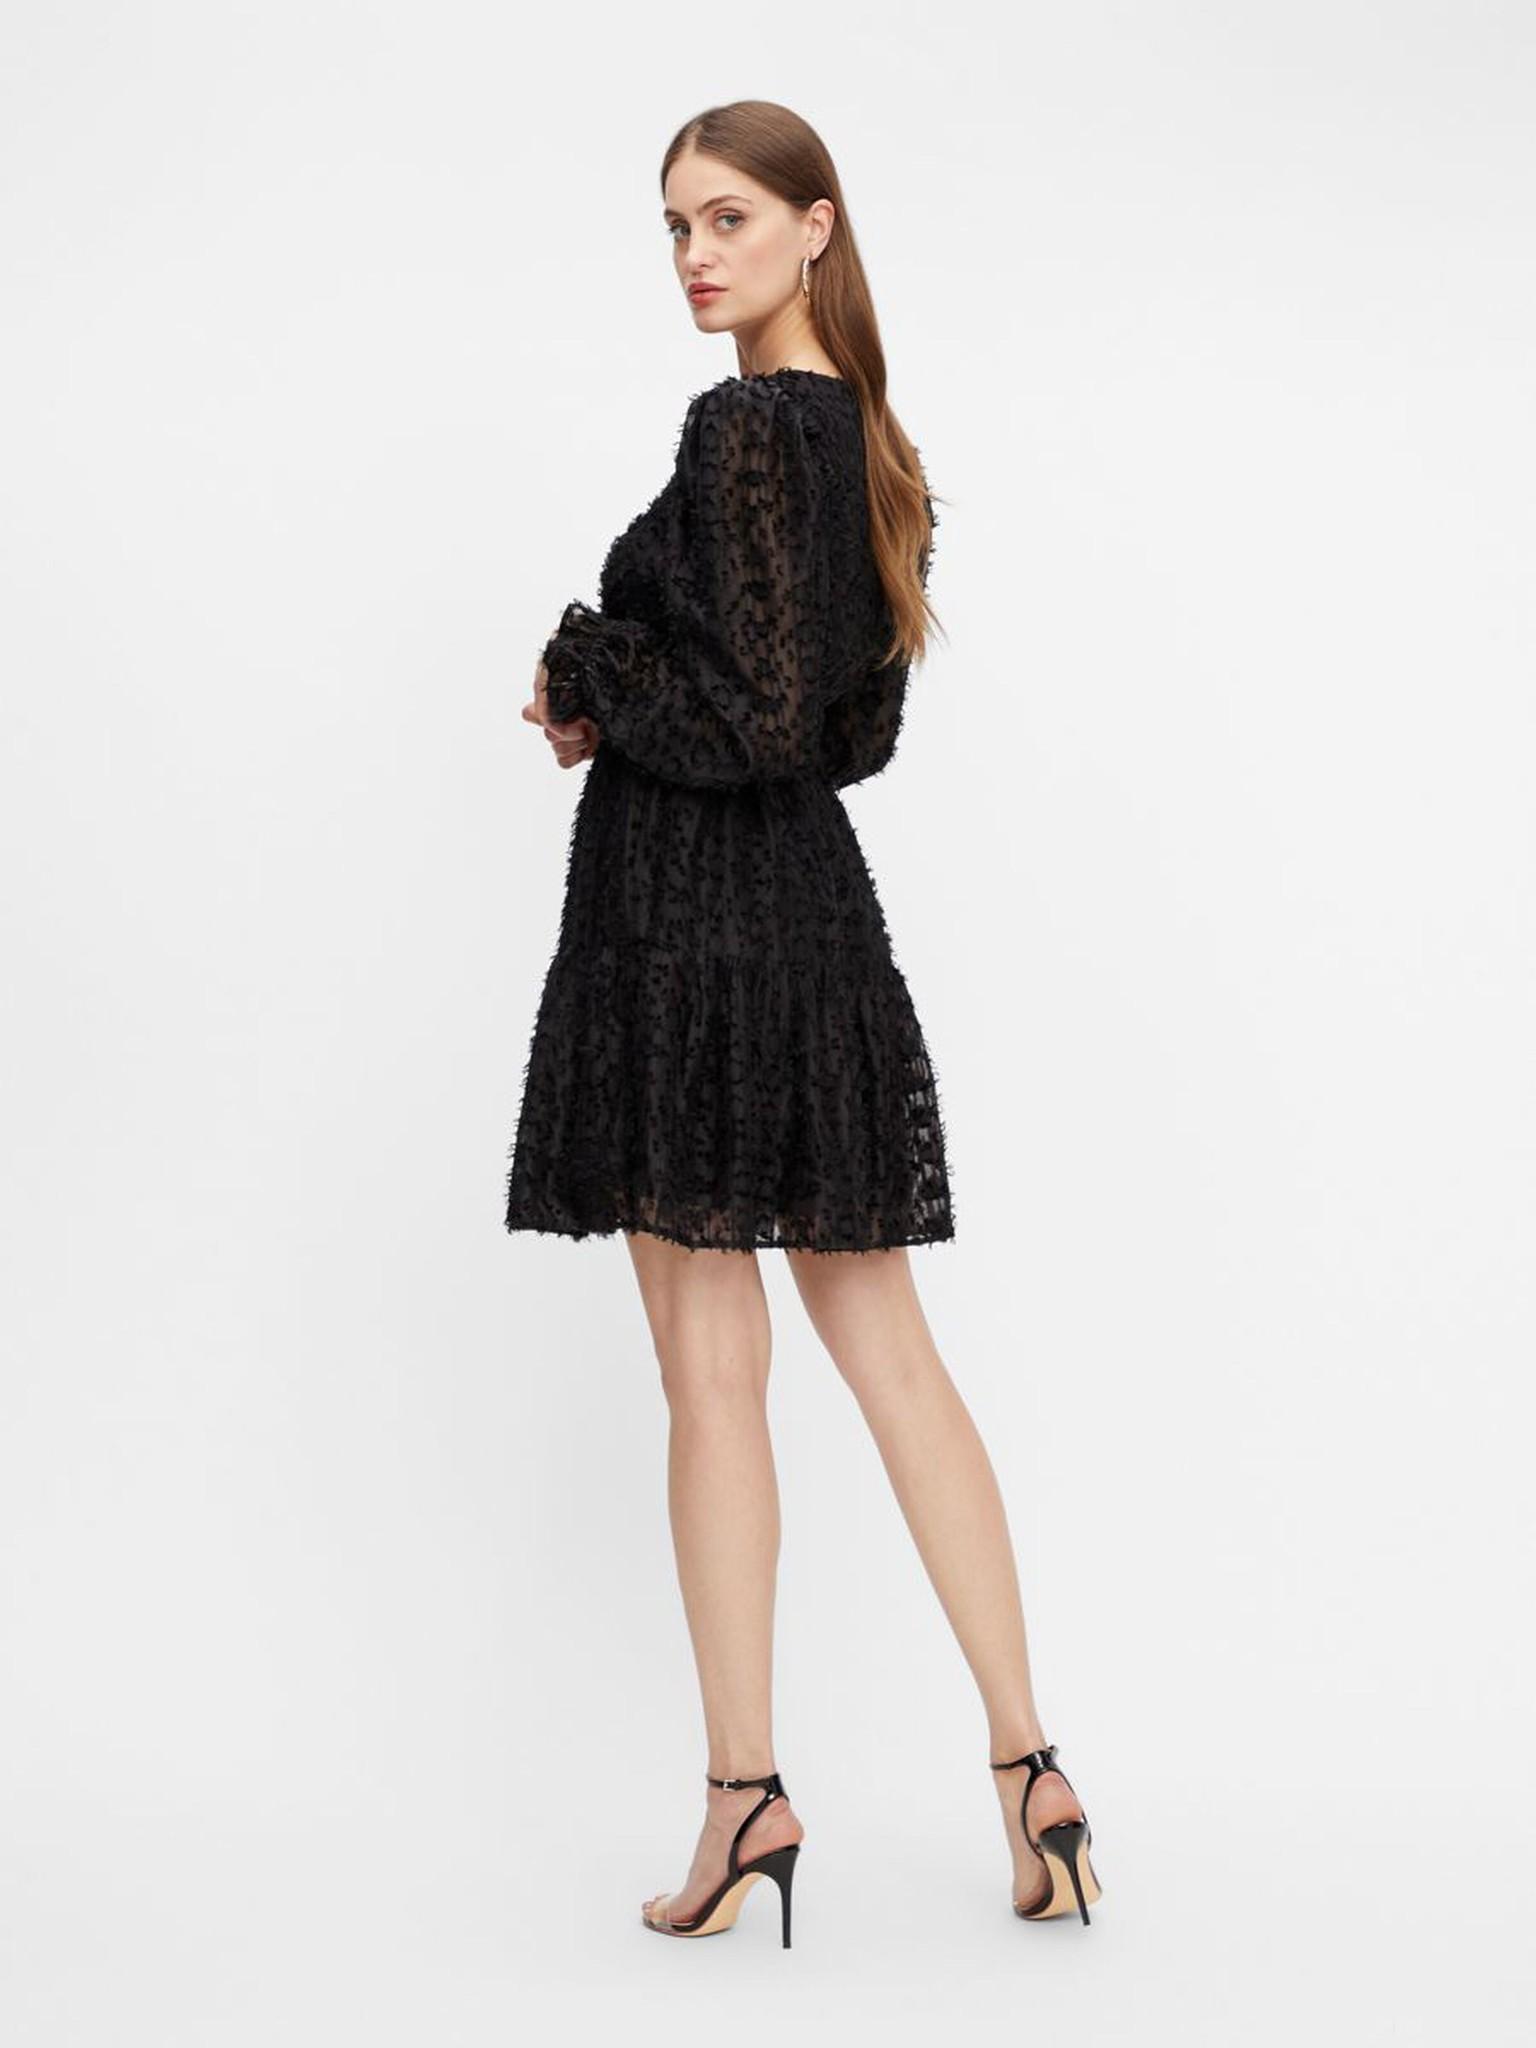 Jurk Vivian dress black-5